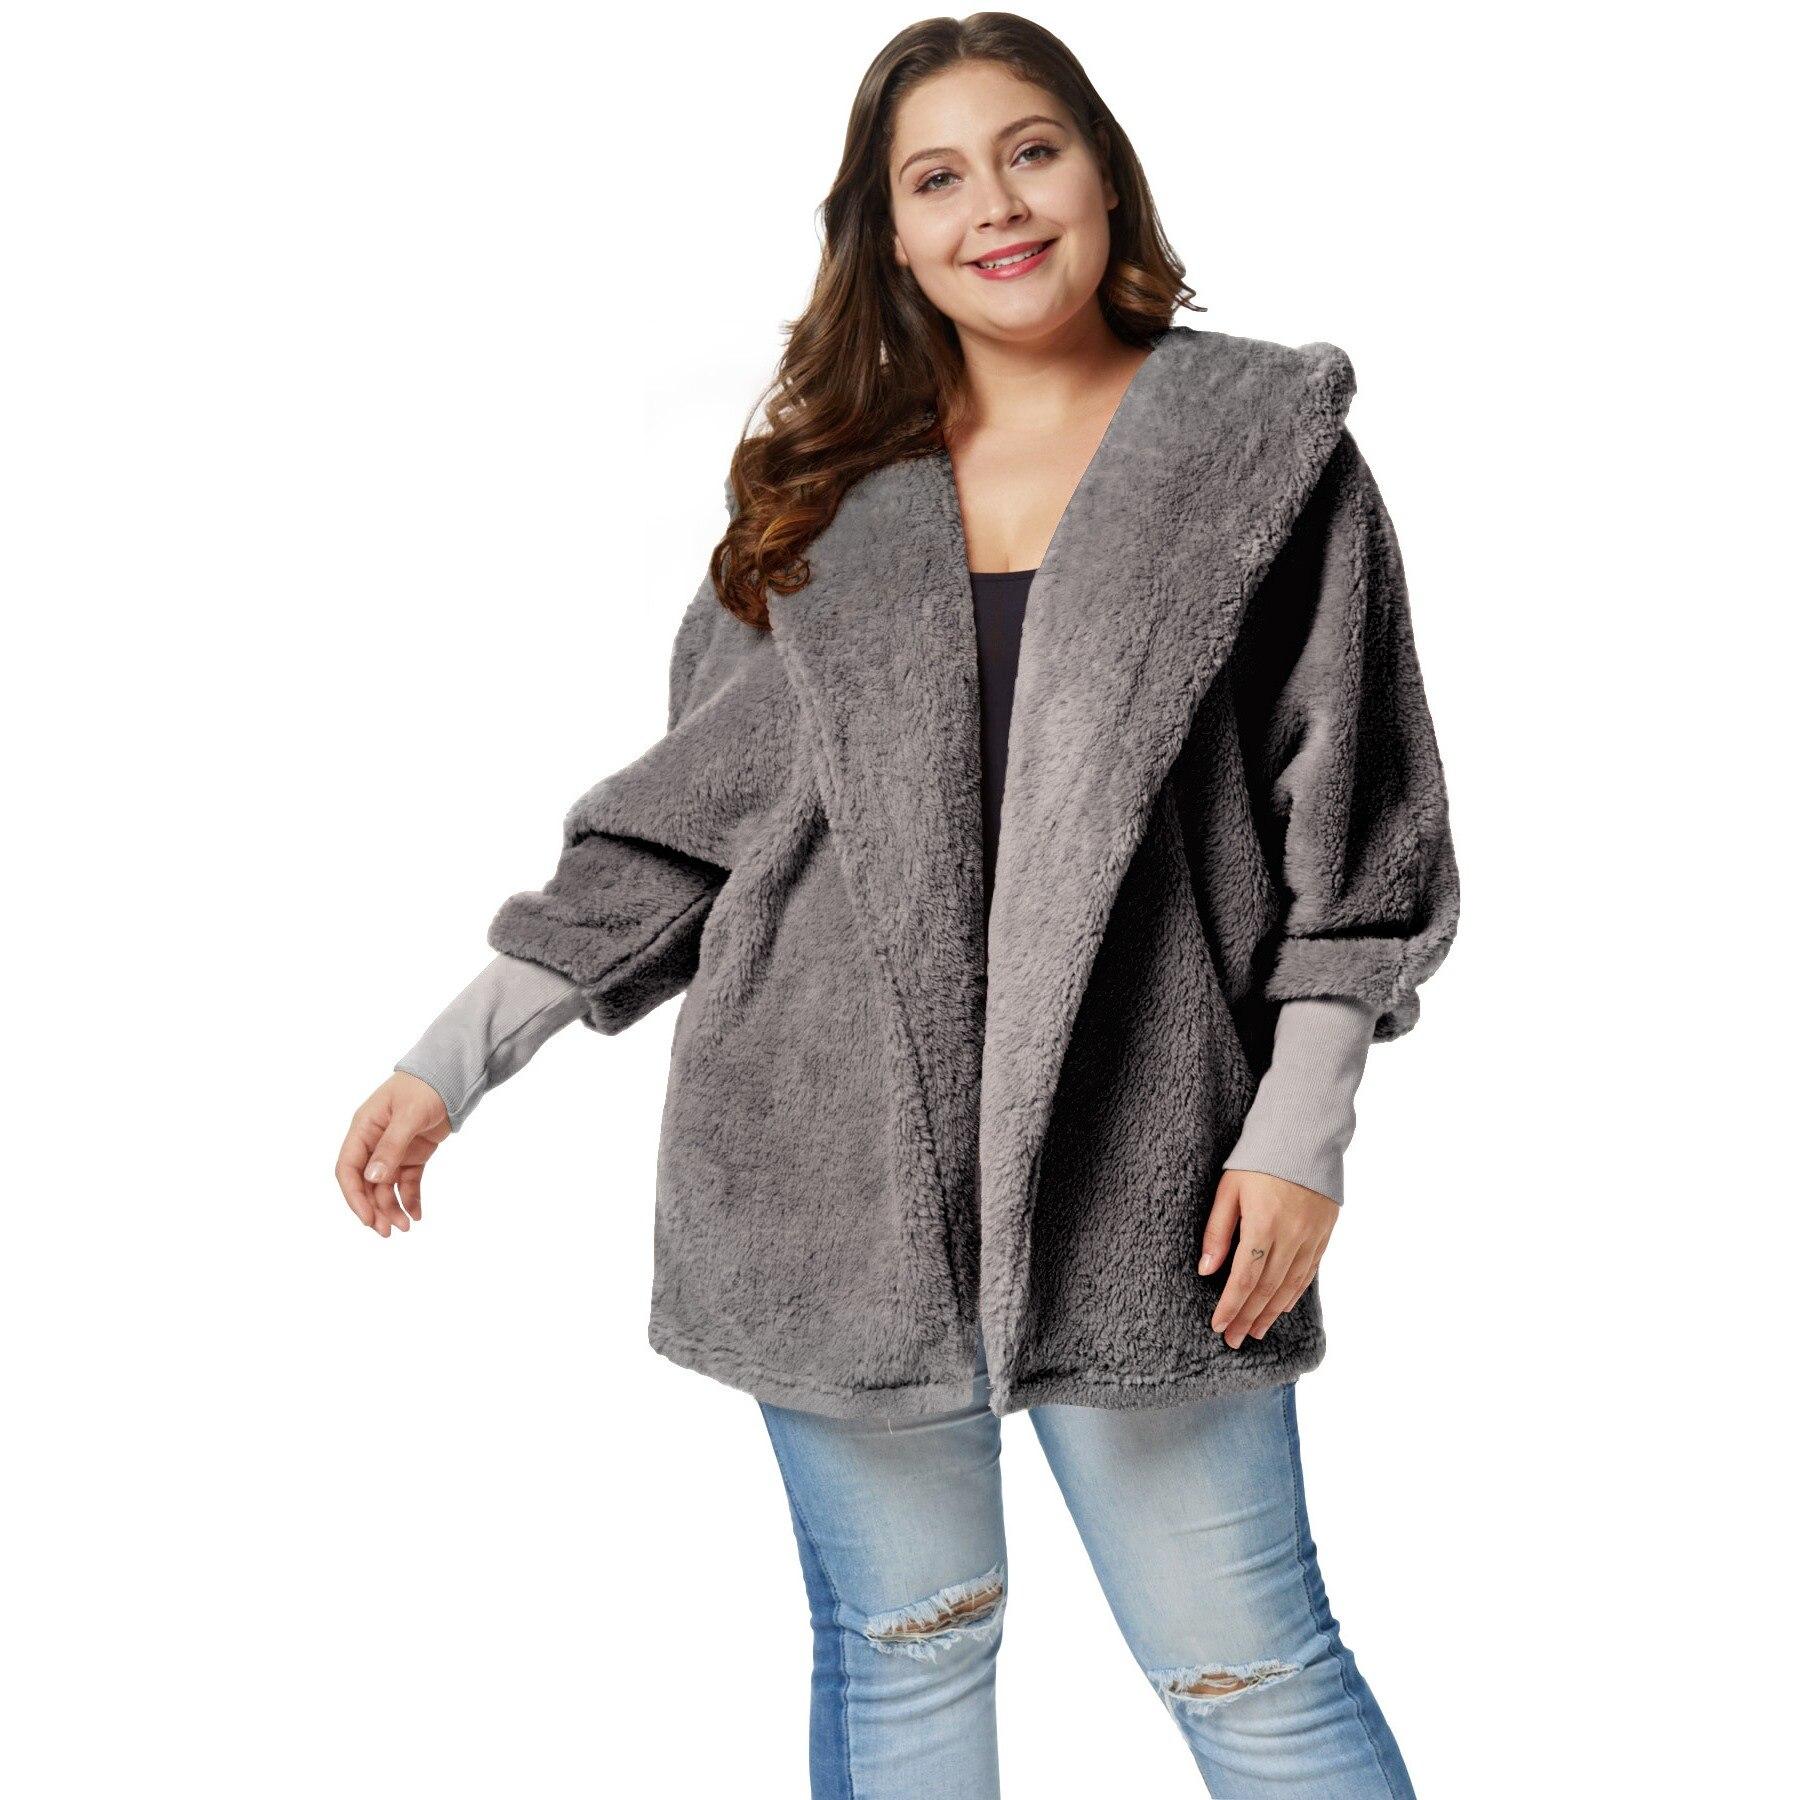 Plusee Teddy Coat Women Best Selling Plus Size Lantern Sleeve Stylish Winter Warm Plush Soft Loose Hooded Basic Casual Overcoat